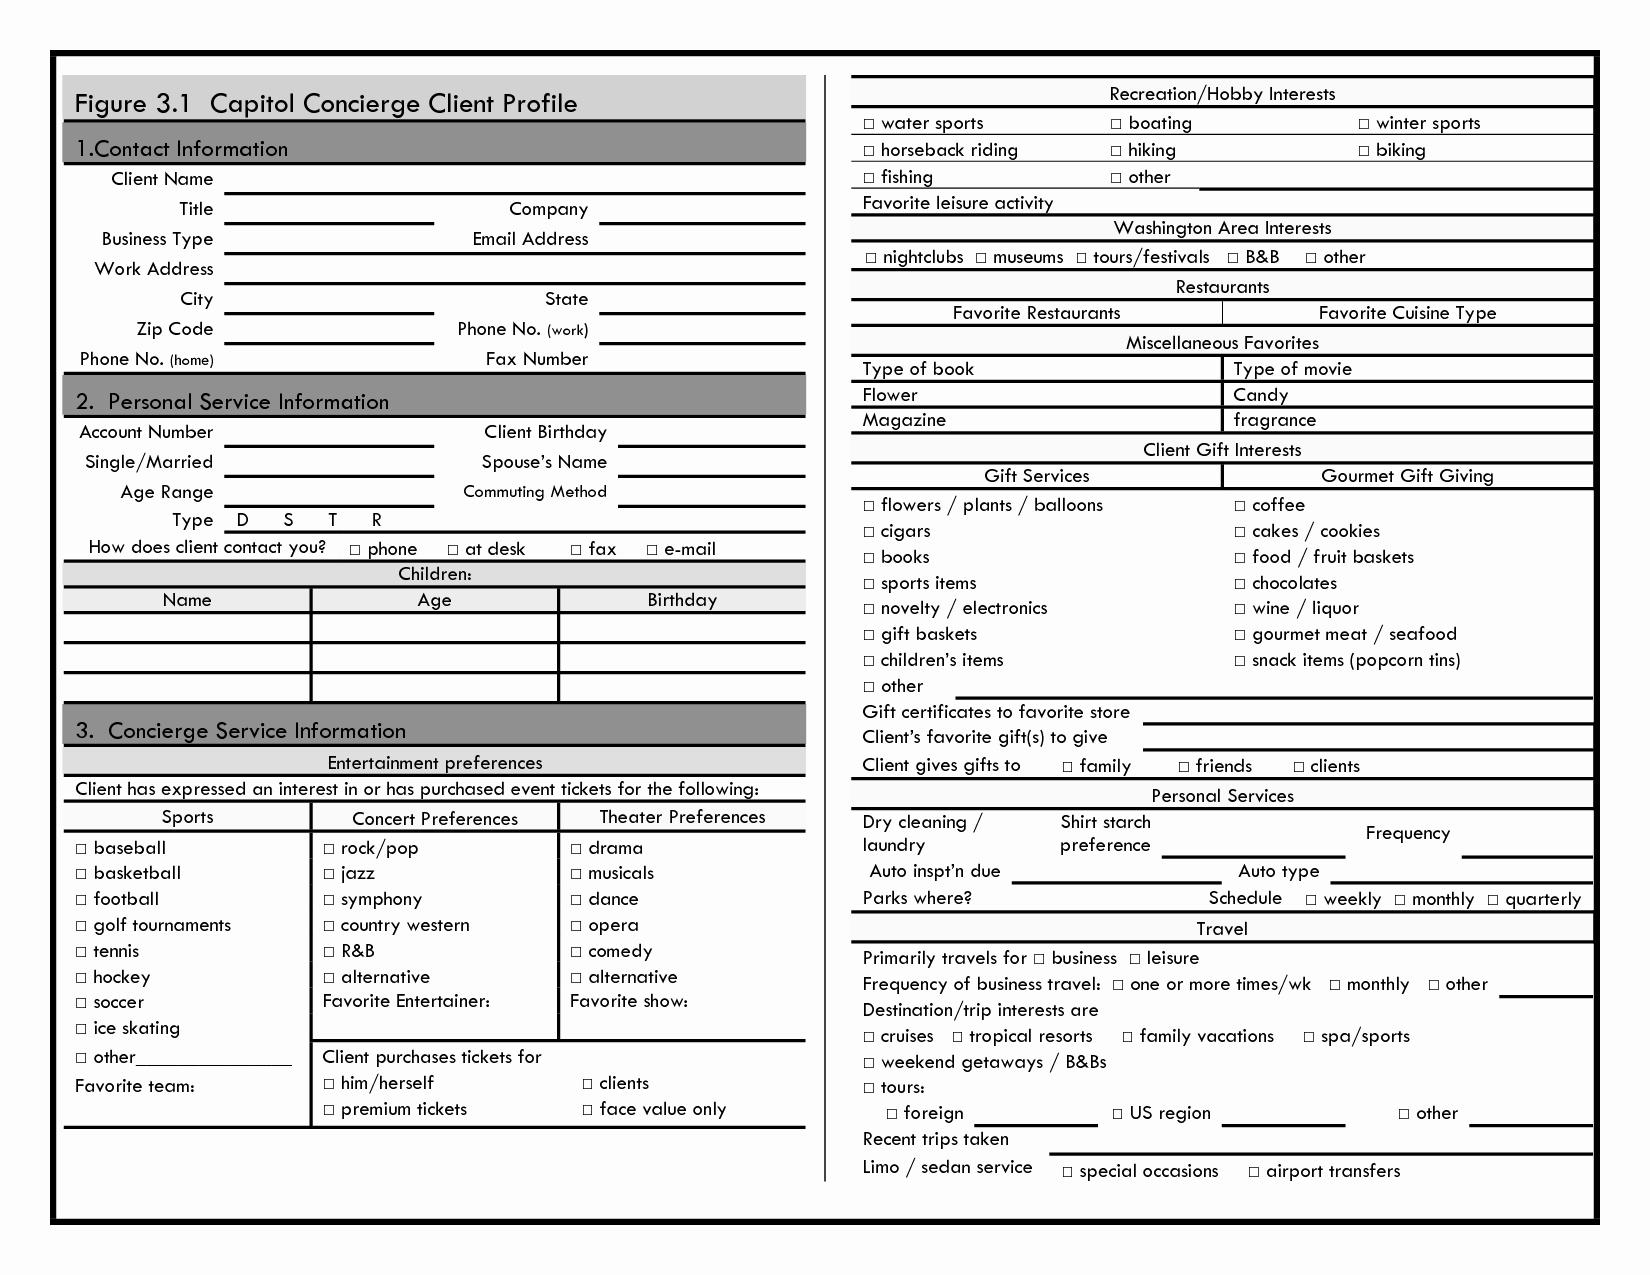 Customer Profile Template Word New 14 Design Client Profile Template Interior Design